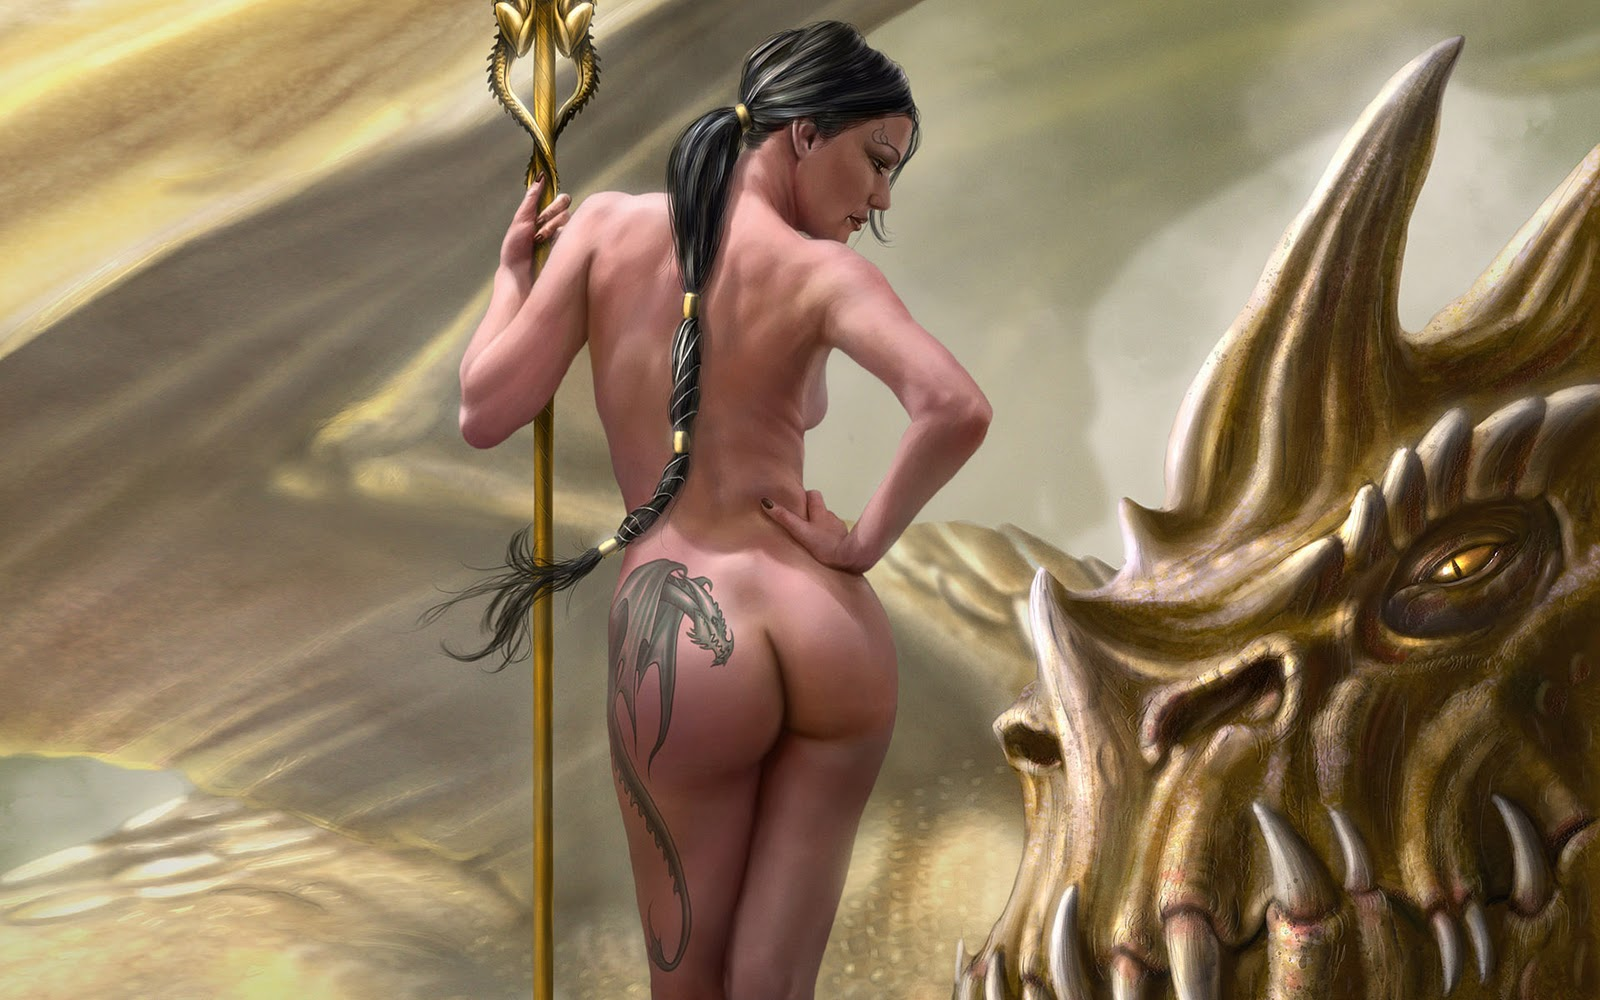 Fuckland of 3d orcs download erotic movies